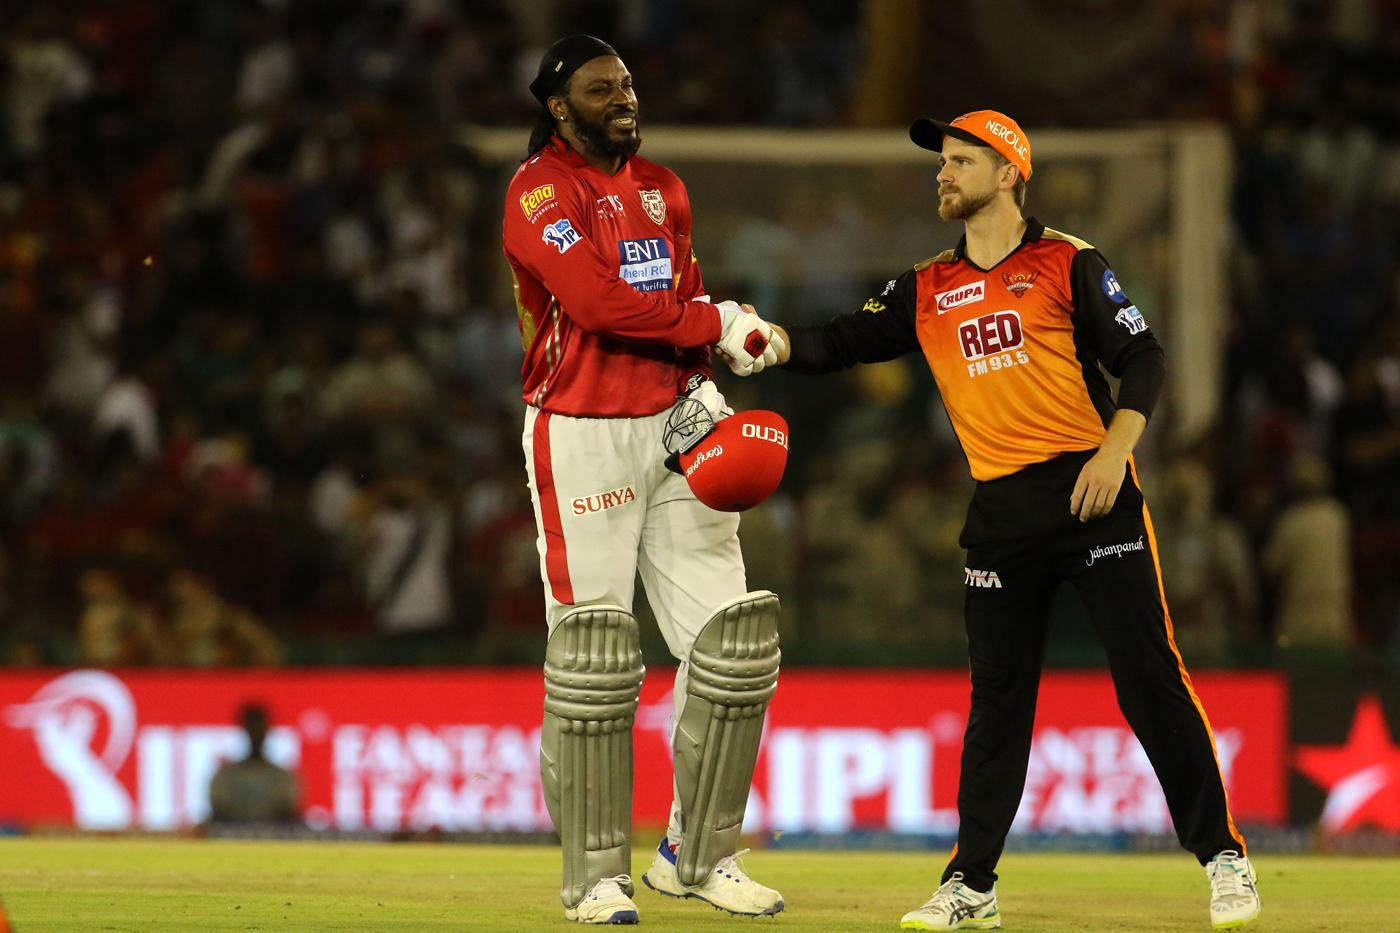 KXIP vs SRH  IPL 2018 MATCH No 16